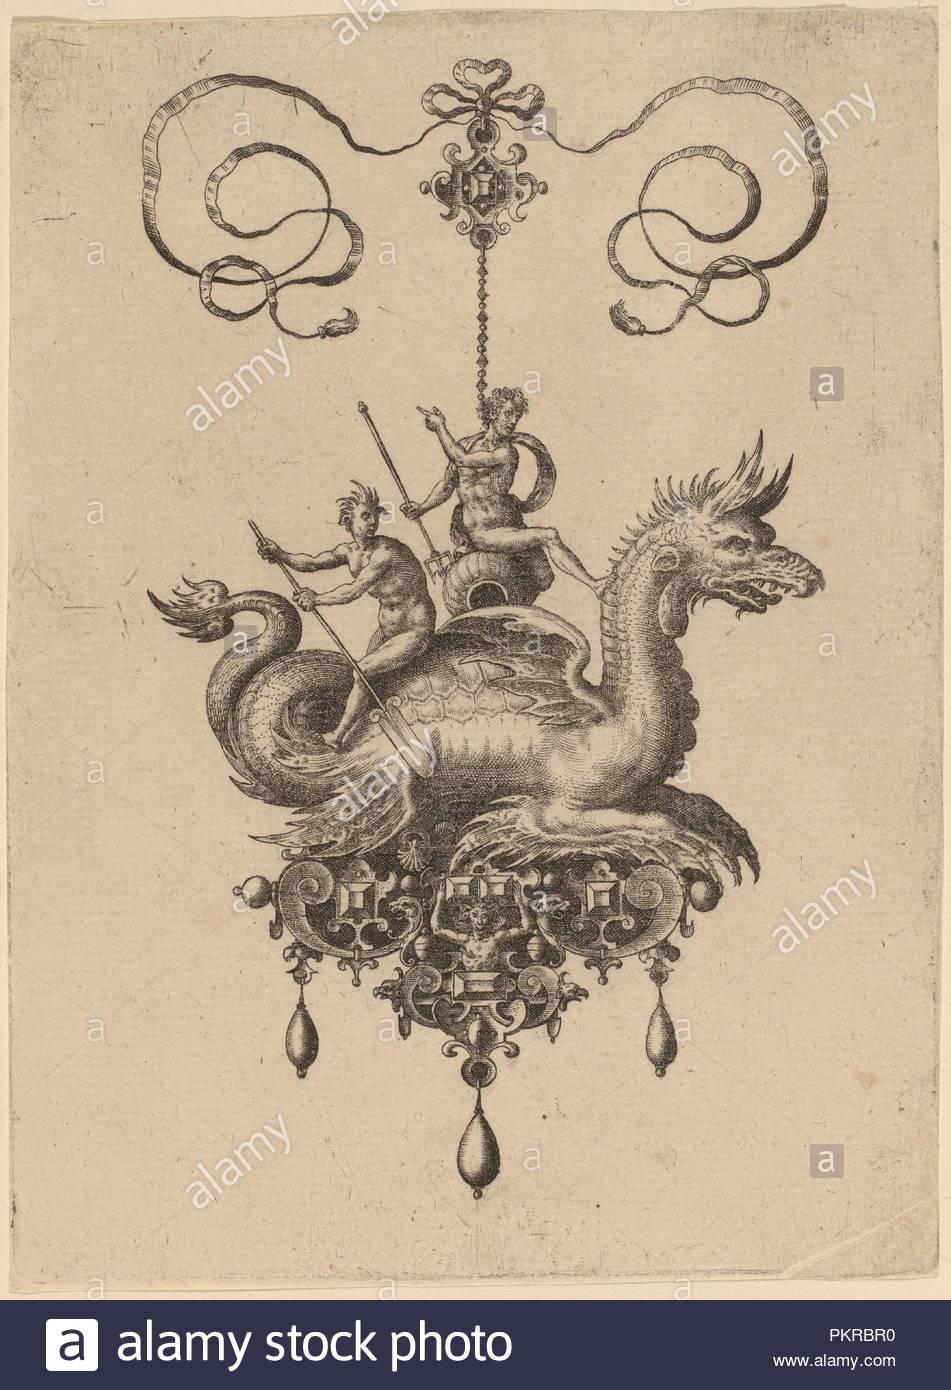 Jewelry Design. Dated: 1582. Medium: engraving. Museum: National Gallery of Art, Washington DC. Author: HANS COLLAERT. - Stock Image